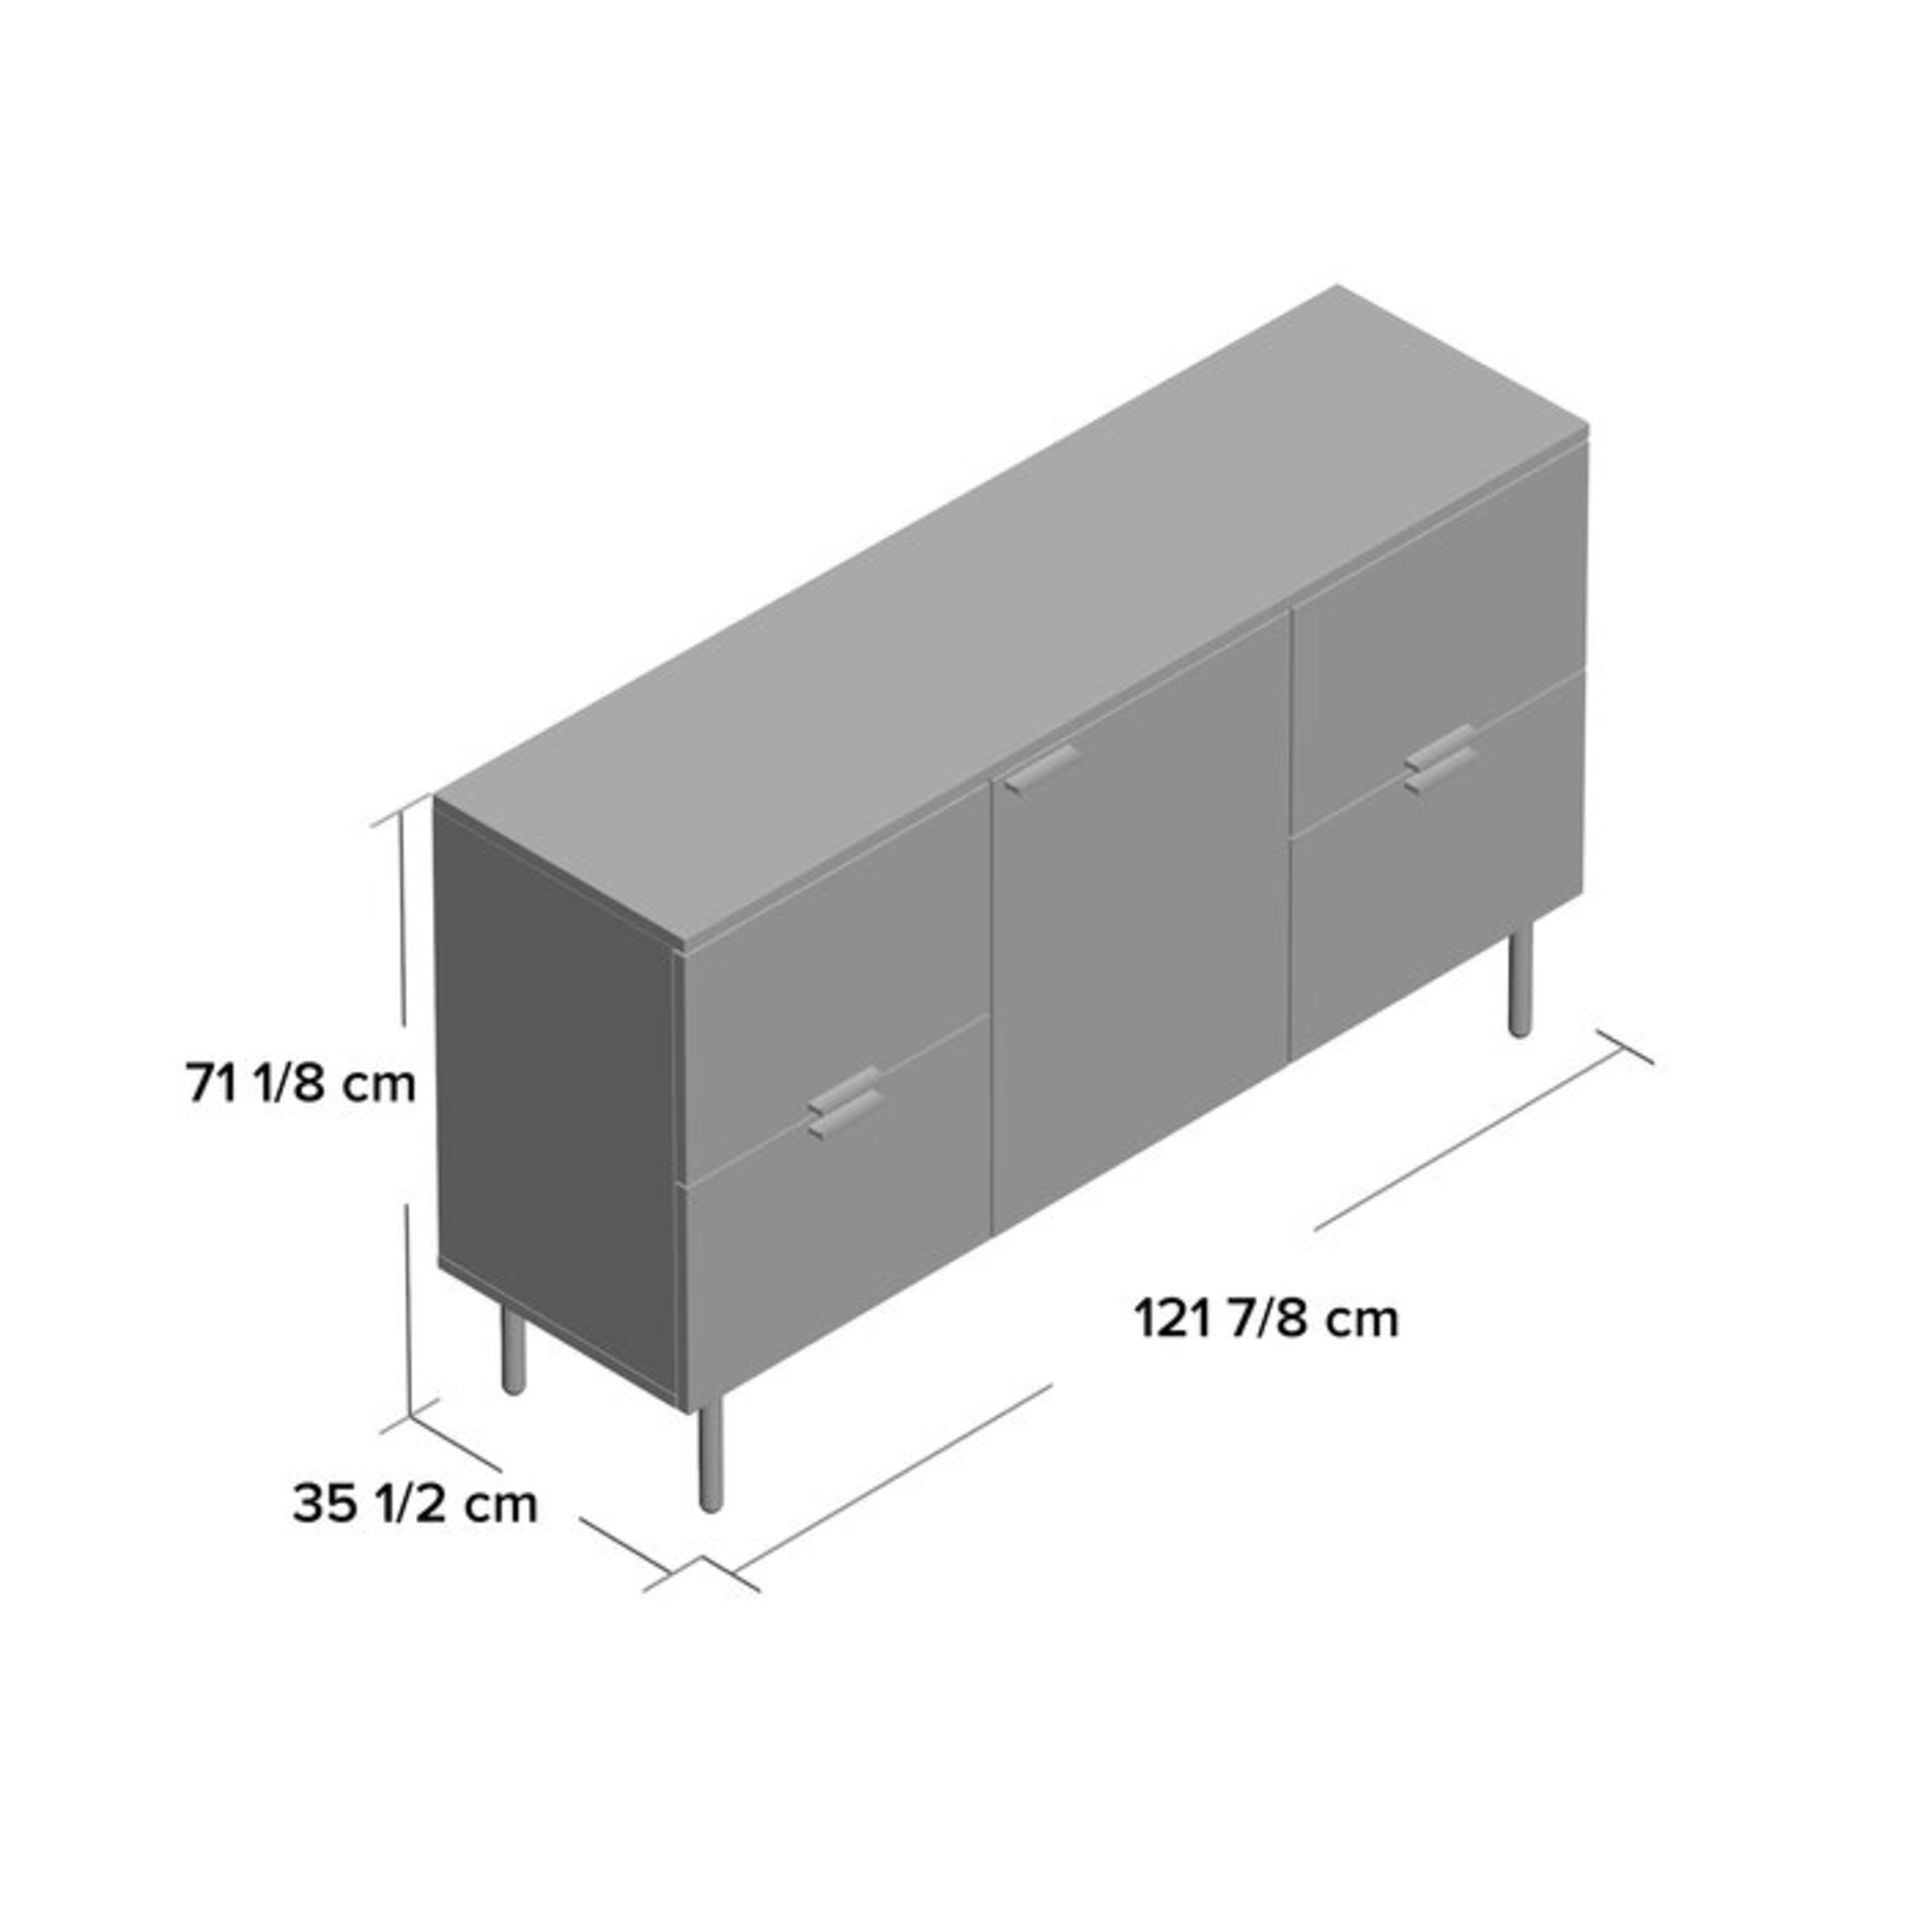 Hector Sideboard - RRP £289.99 - Image 3 of 3